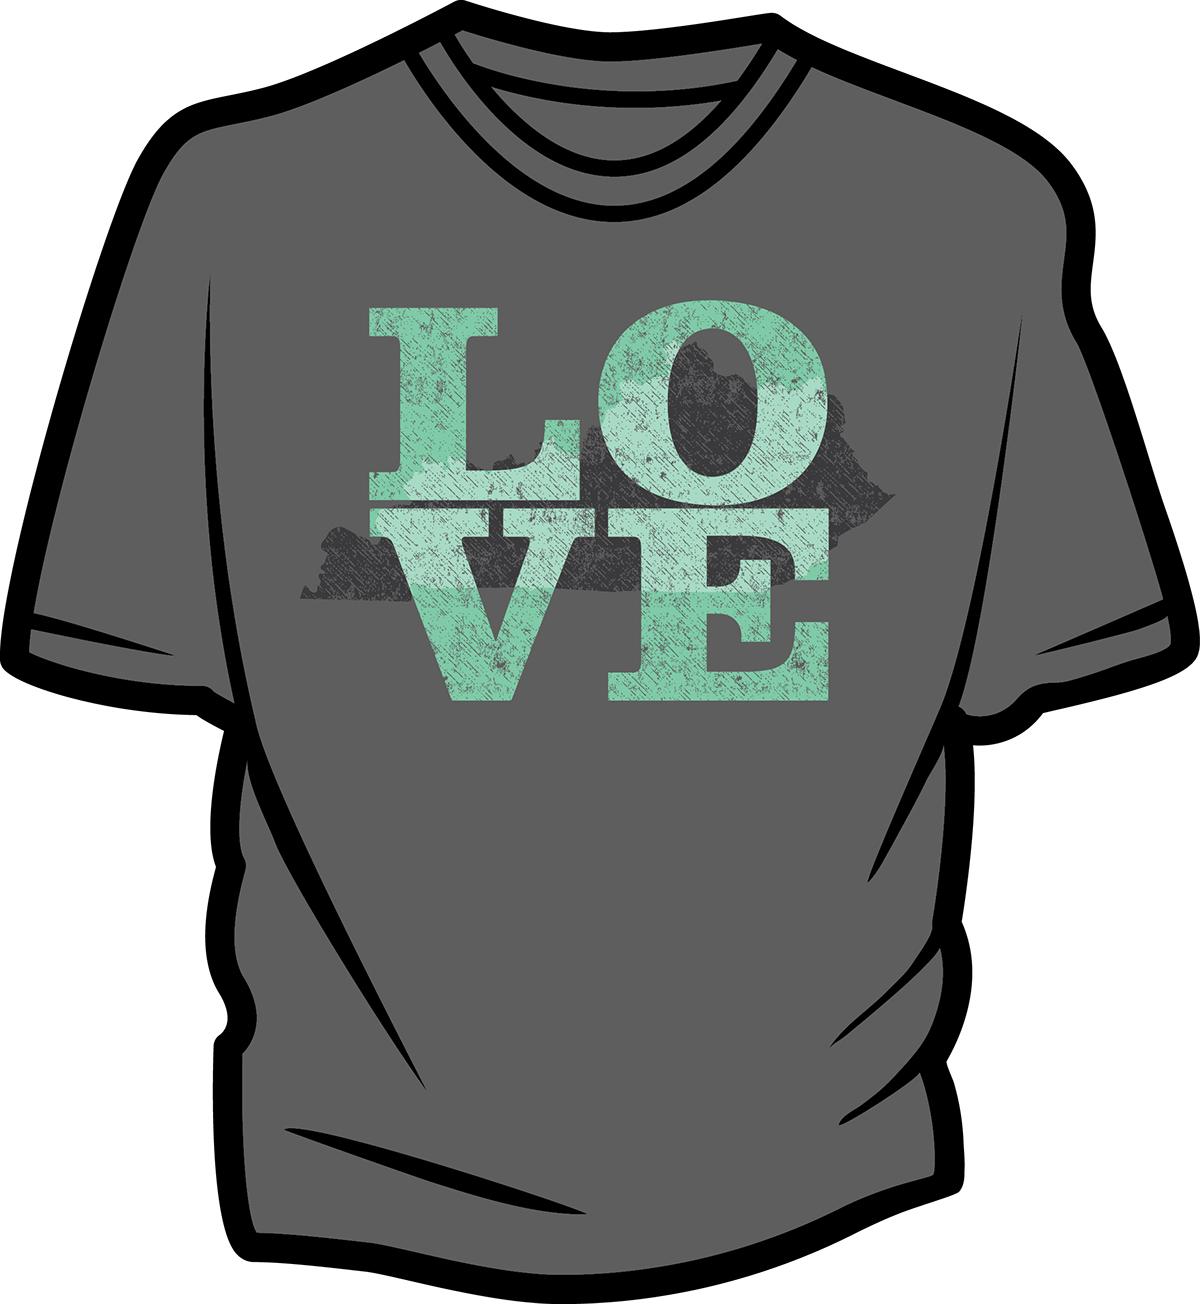 Shirt design louisville ky - State Pride Shirt Concept Design